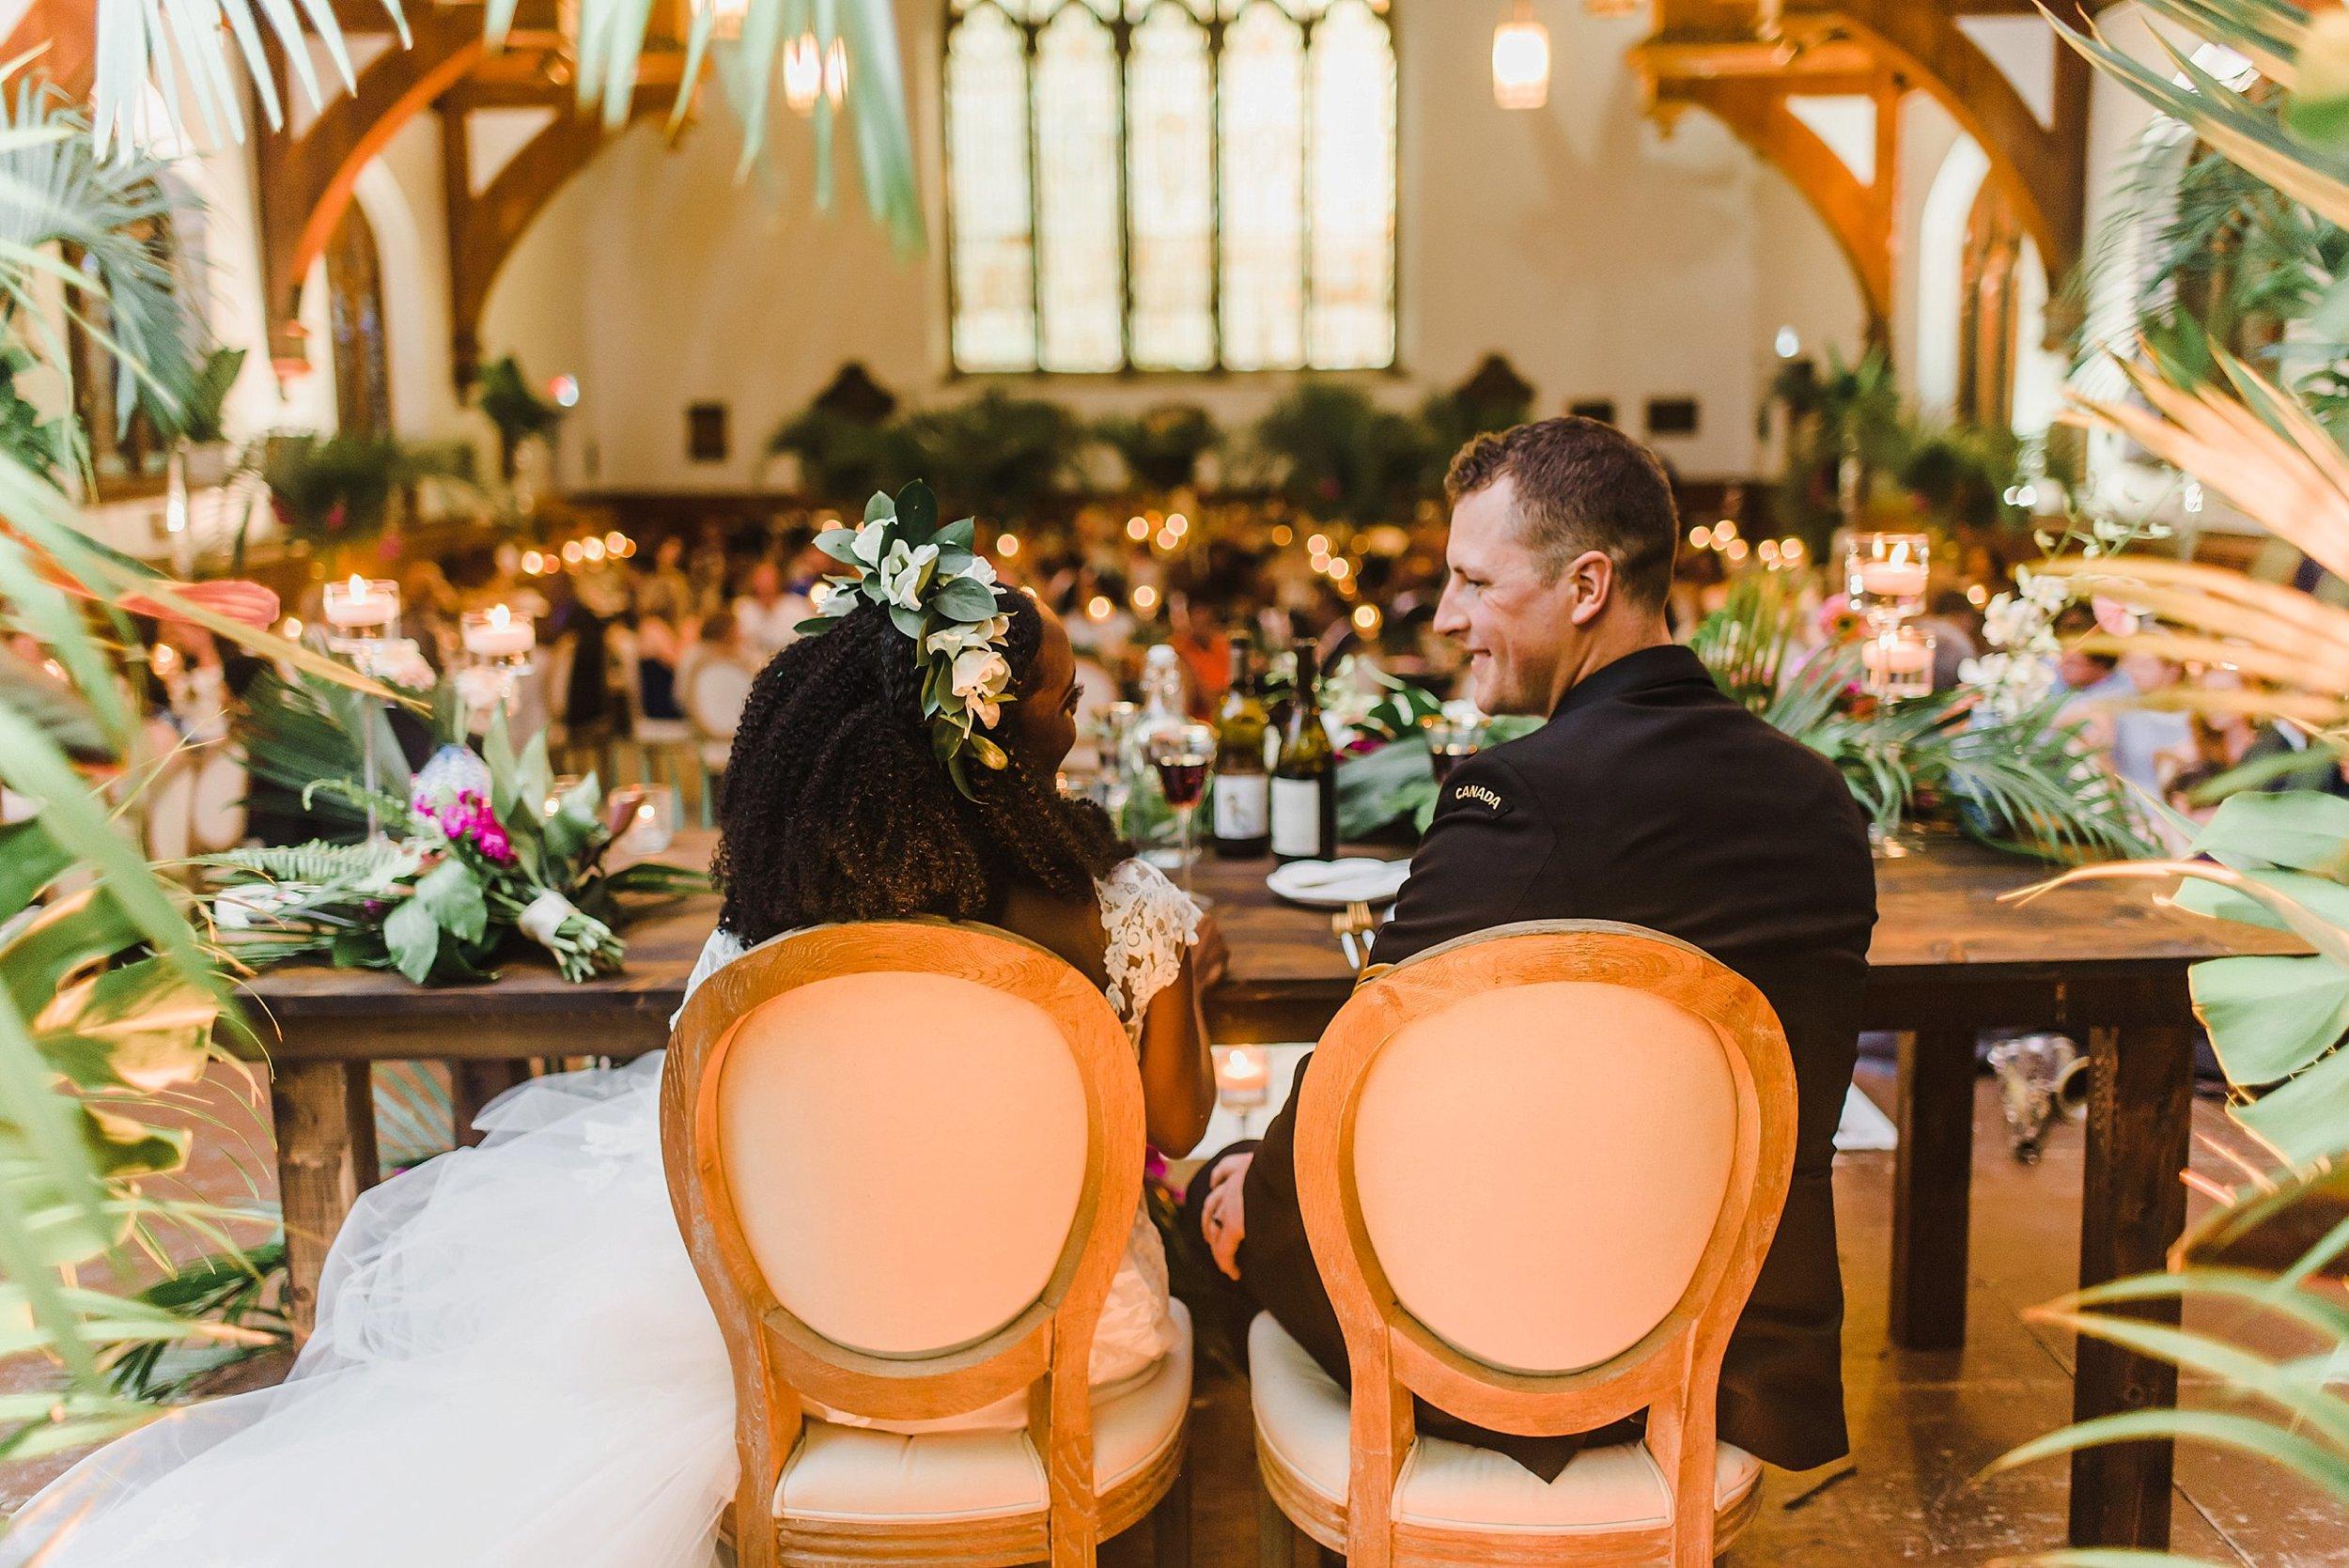 light airy indie fine art ottawa wedding photographer | Ali and Batoul Photography_1044.jpg